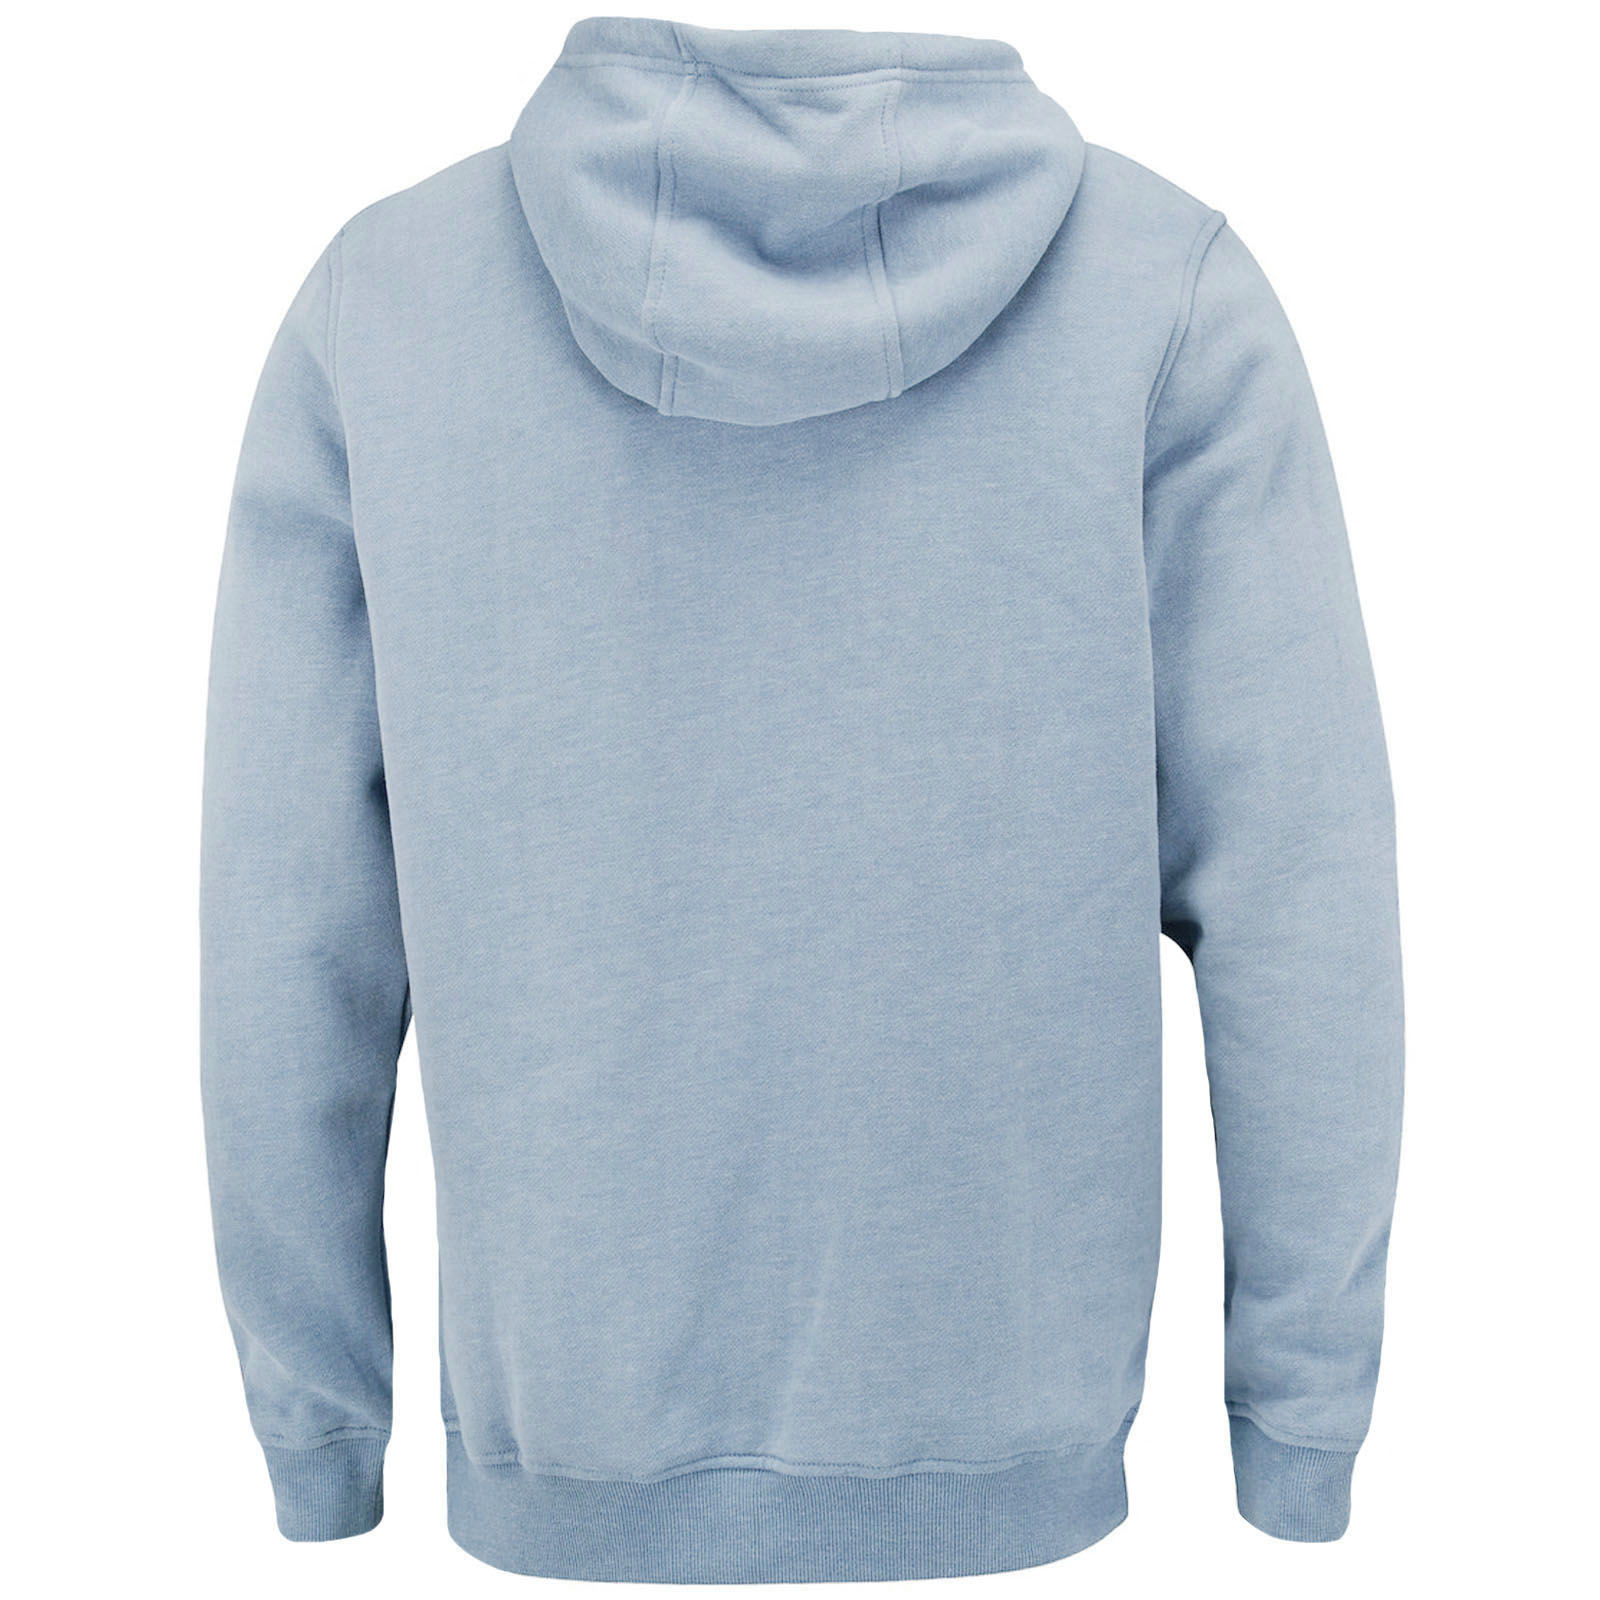 Animal-Pour-Homme-Luna-en-relief-Casual-Sweat-a-Capuche-Sweat-A-Capuche-Pullover-Top